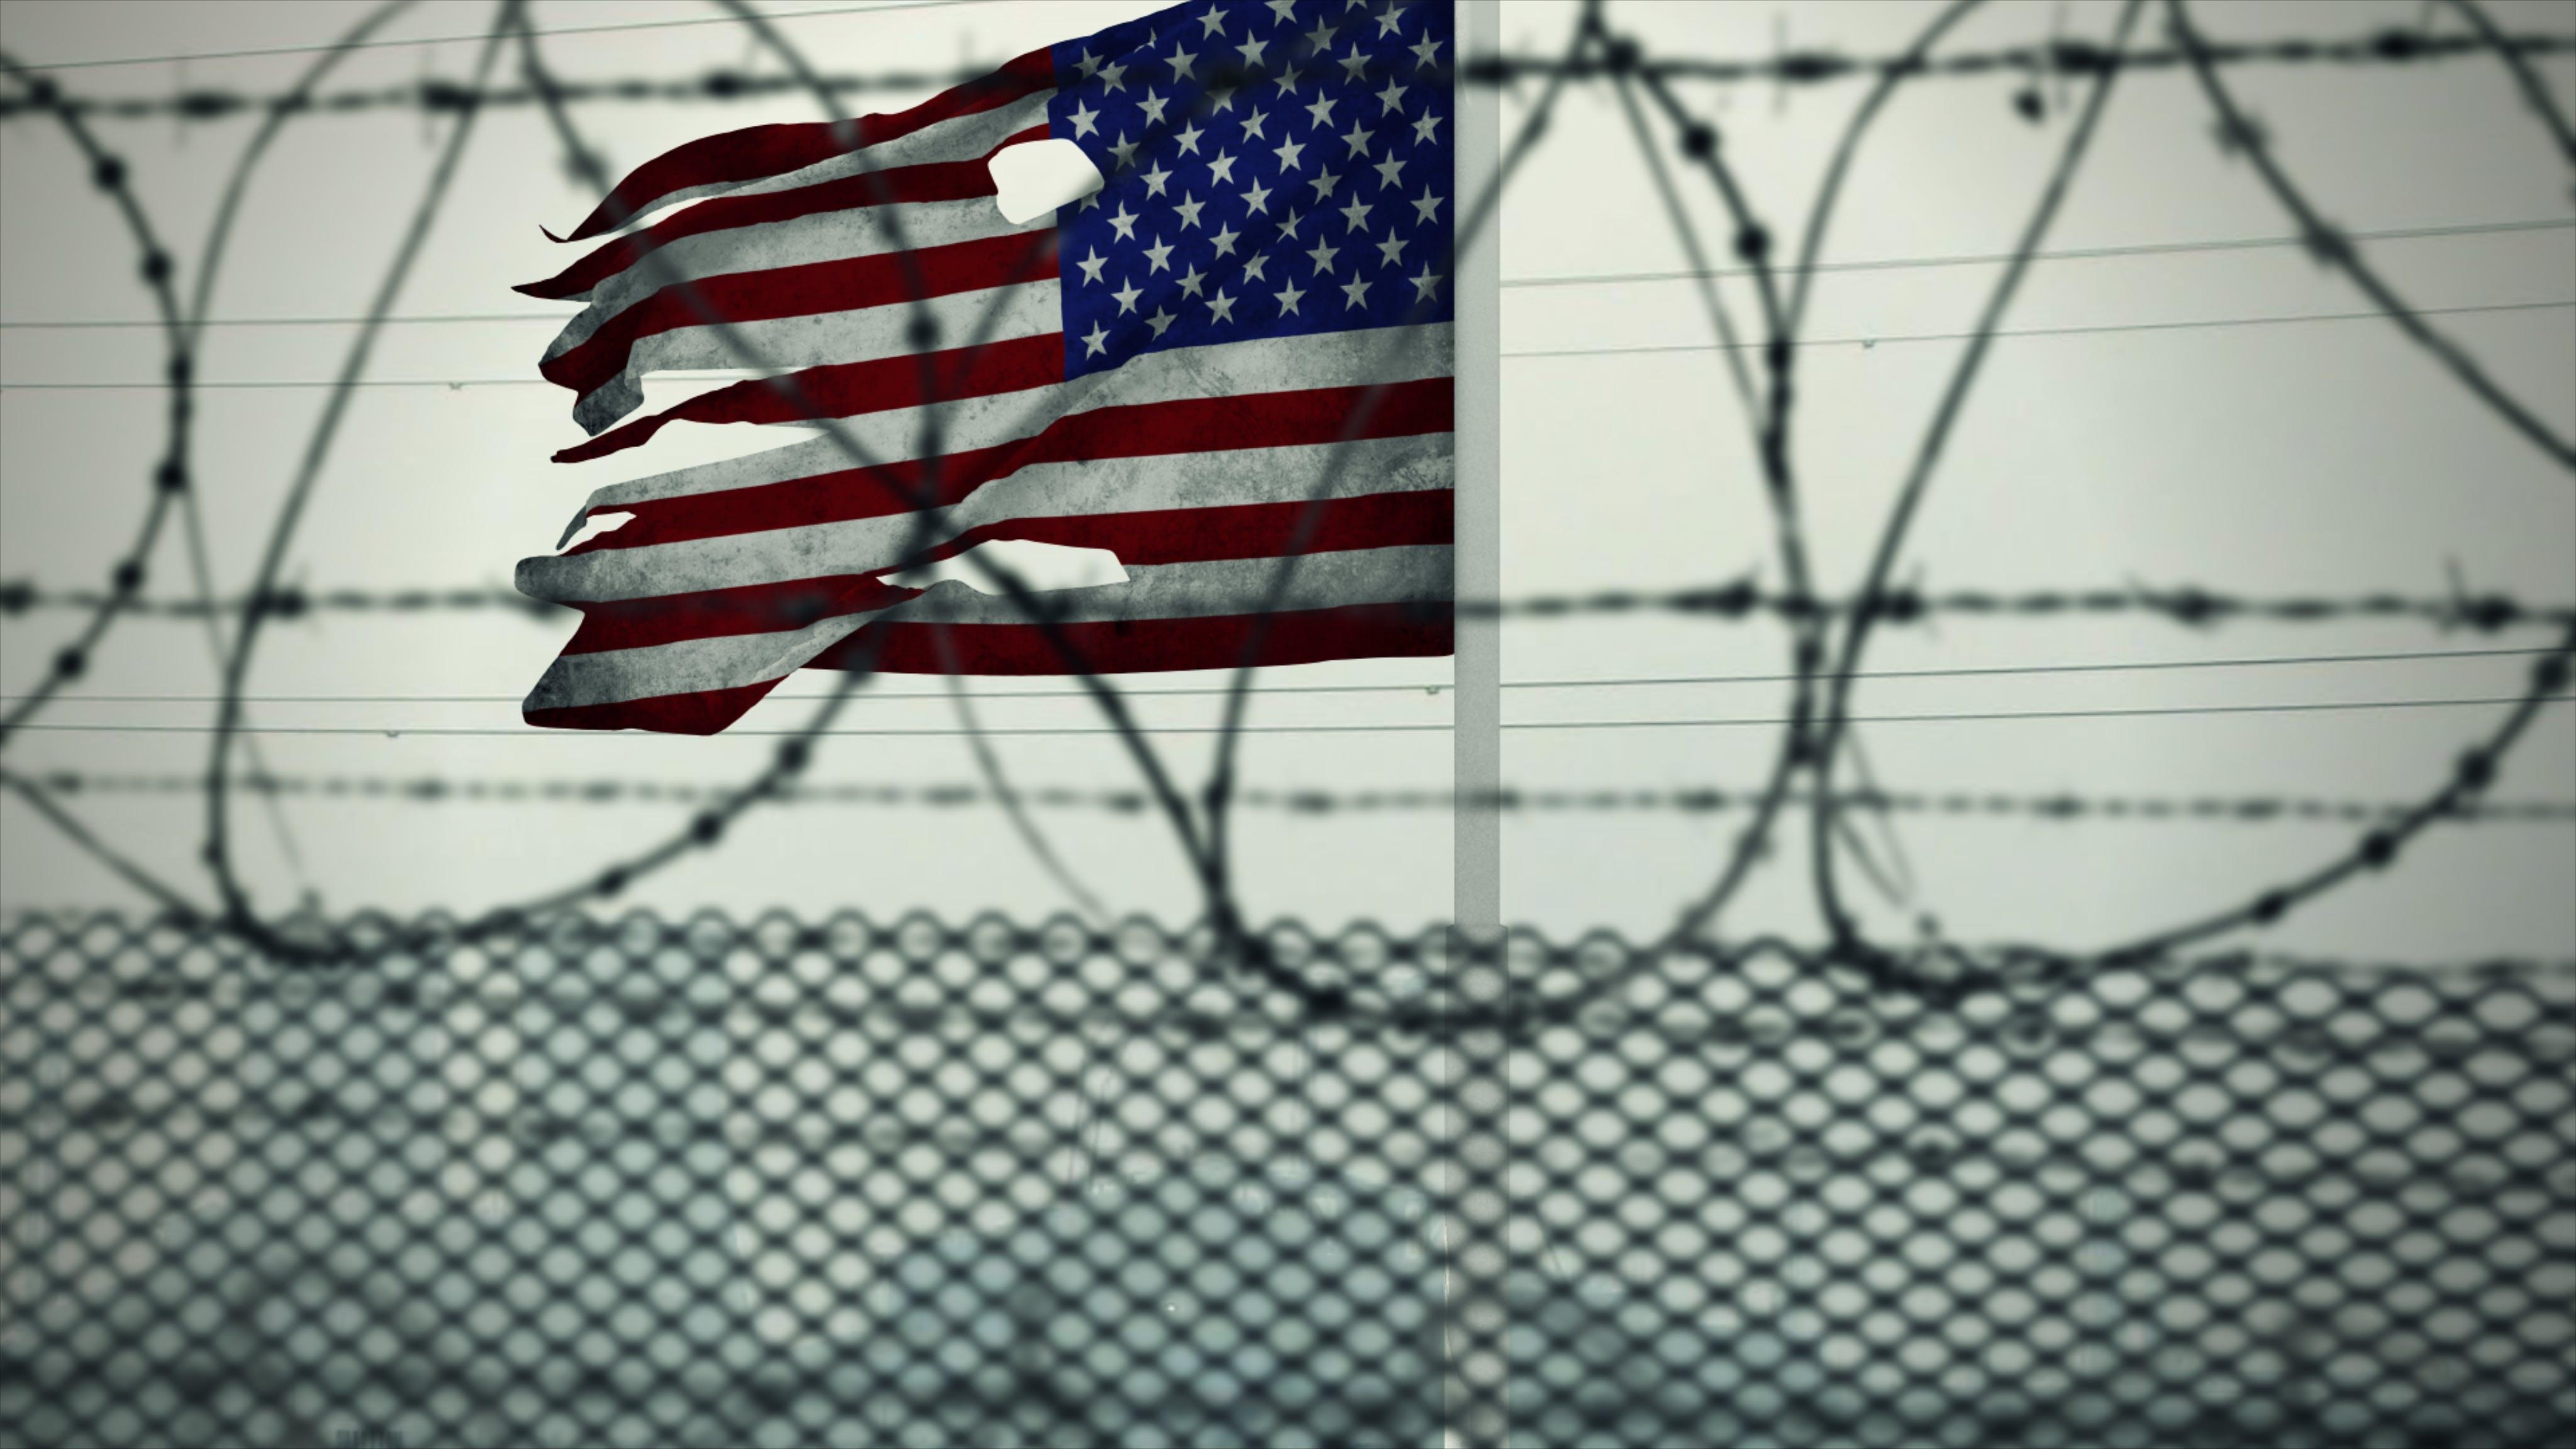 Gratis arkivbilde med Amerikansk flagg, barded wire, fengsel, guantanamo bay